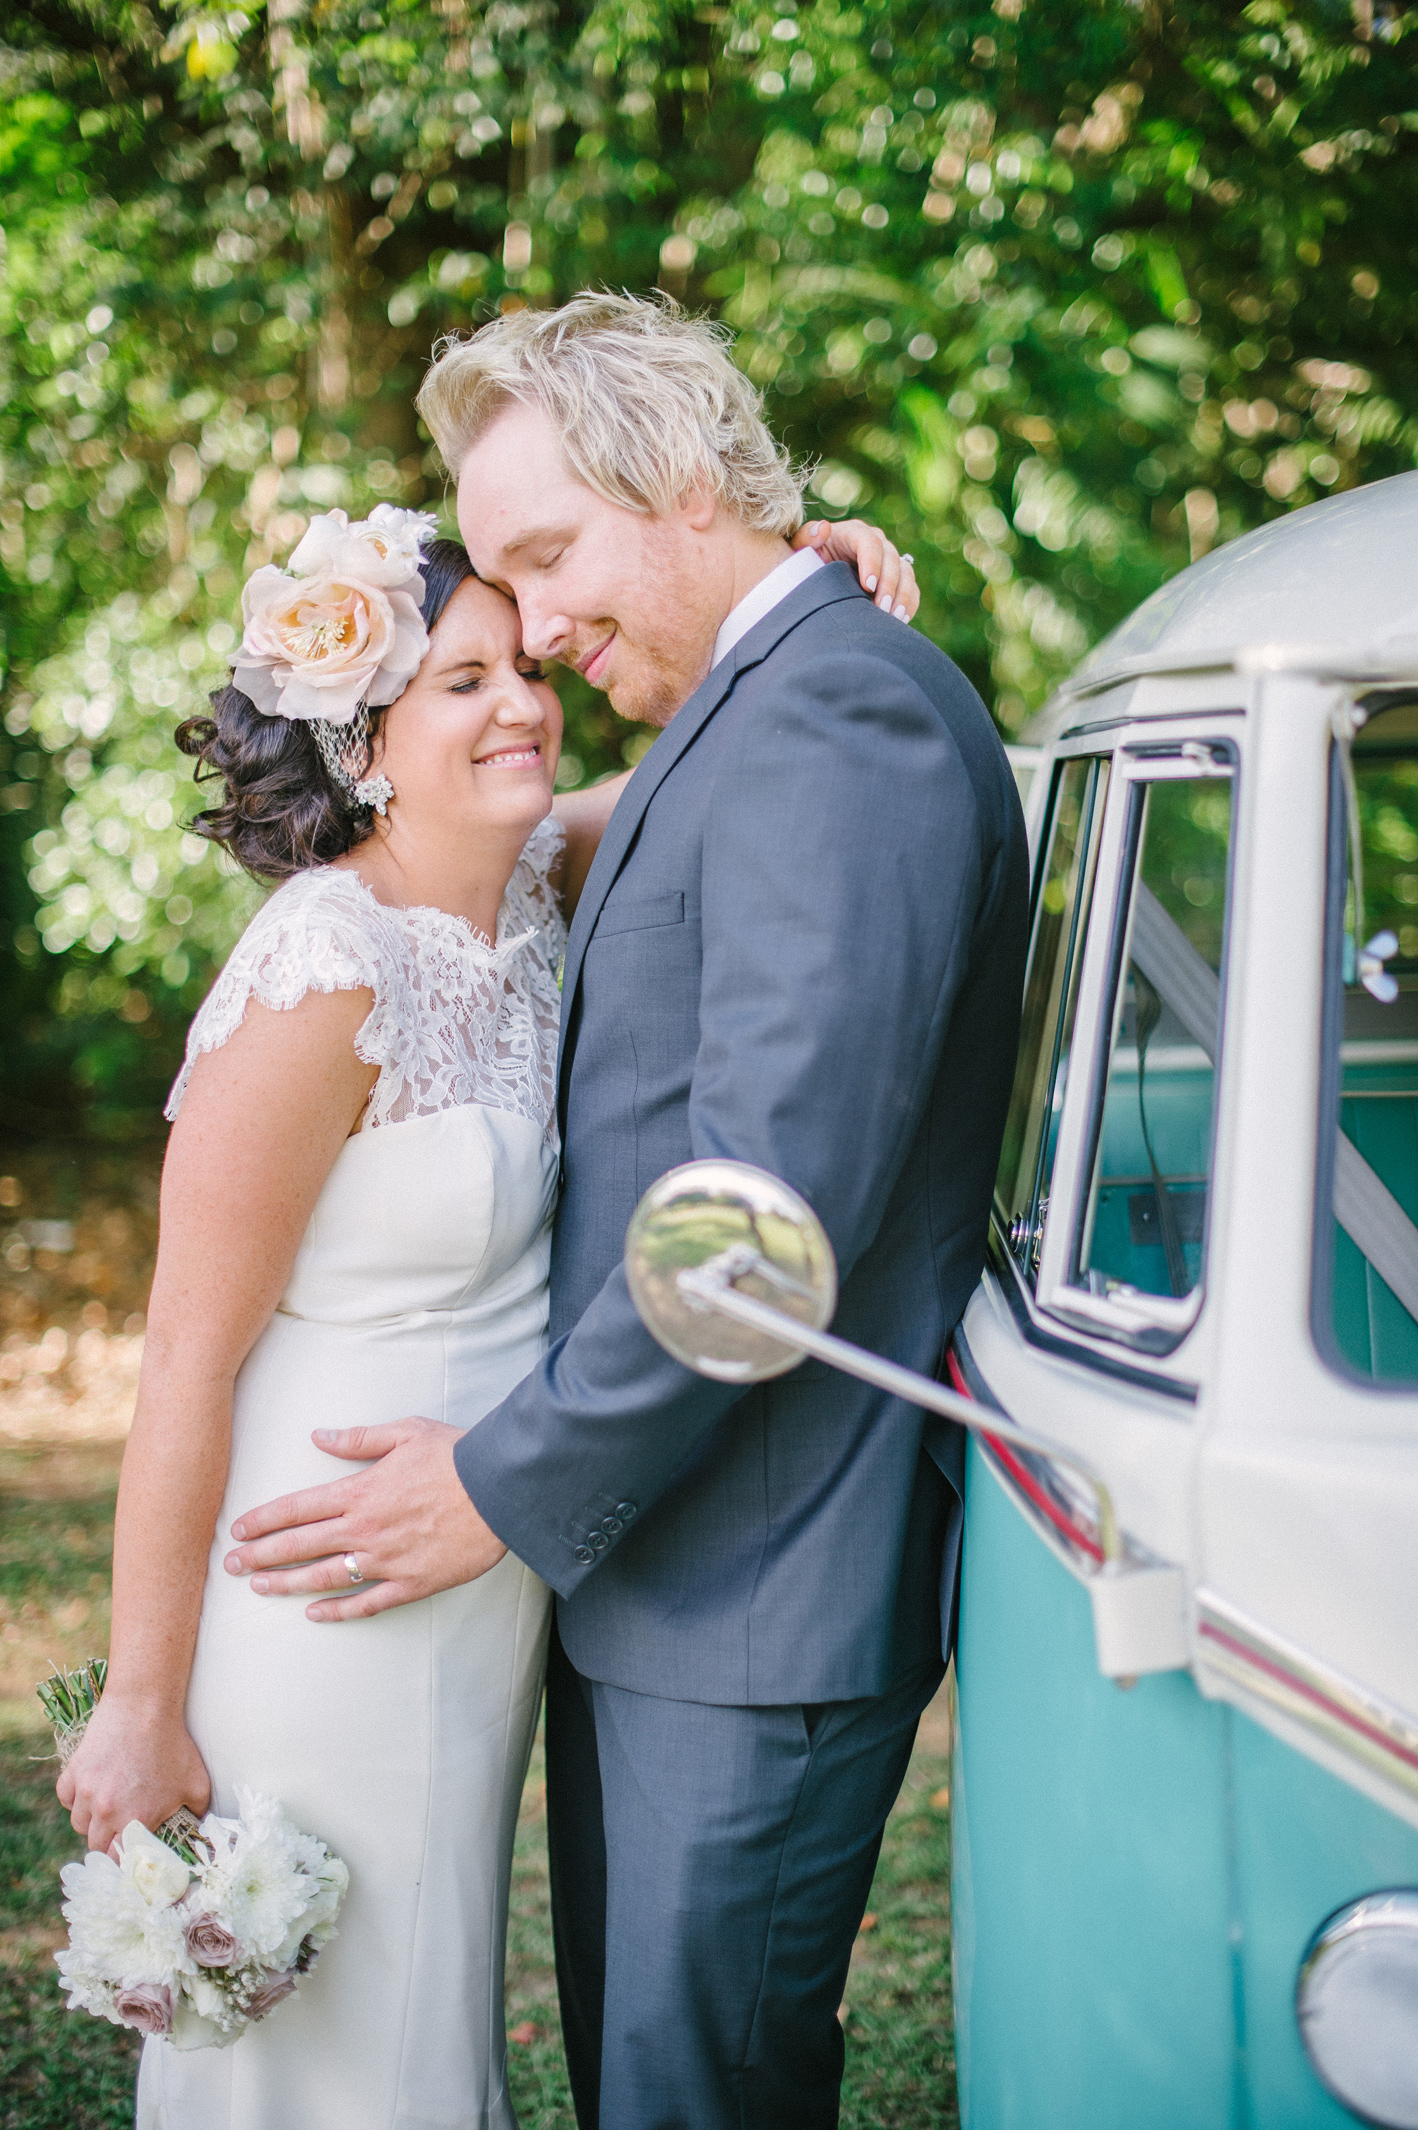 050-hannah-daniel-boomerang-farm-wedding-sophie-baker-photography